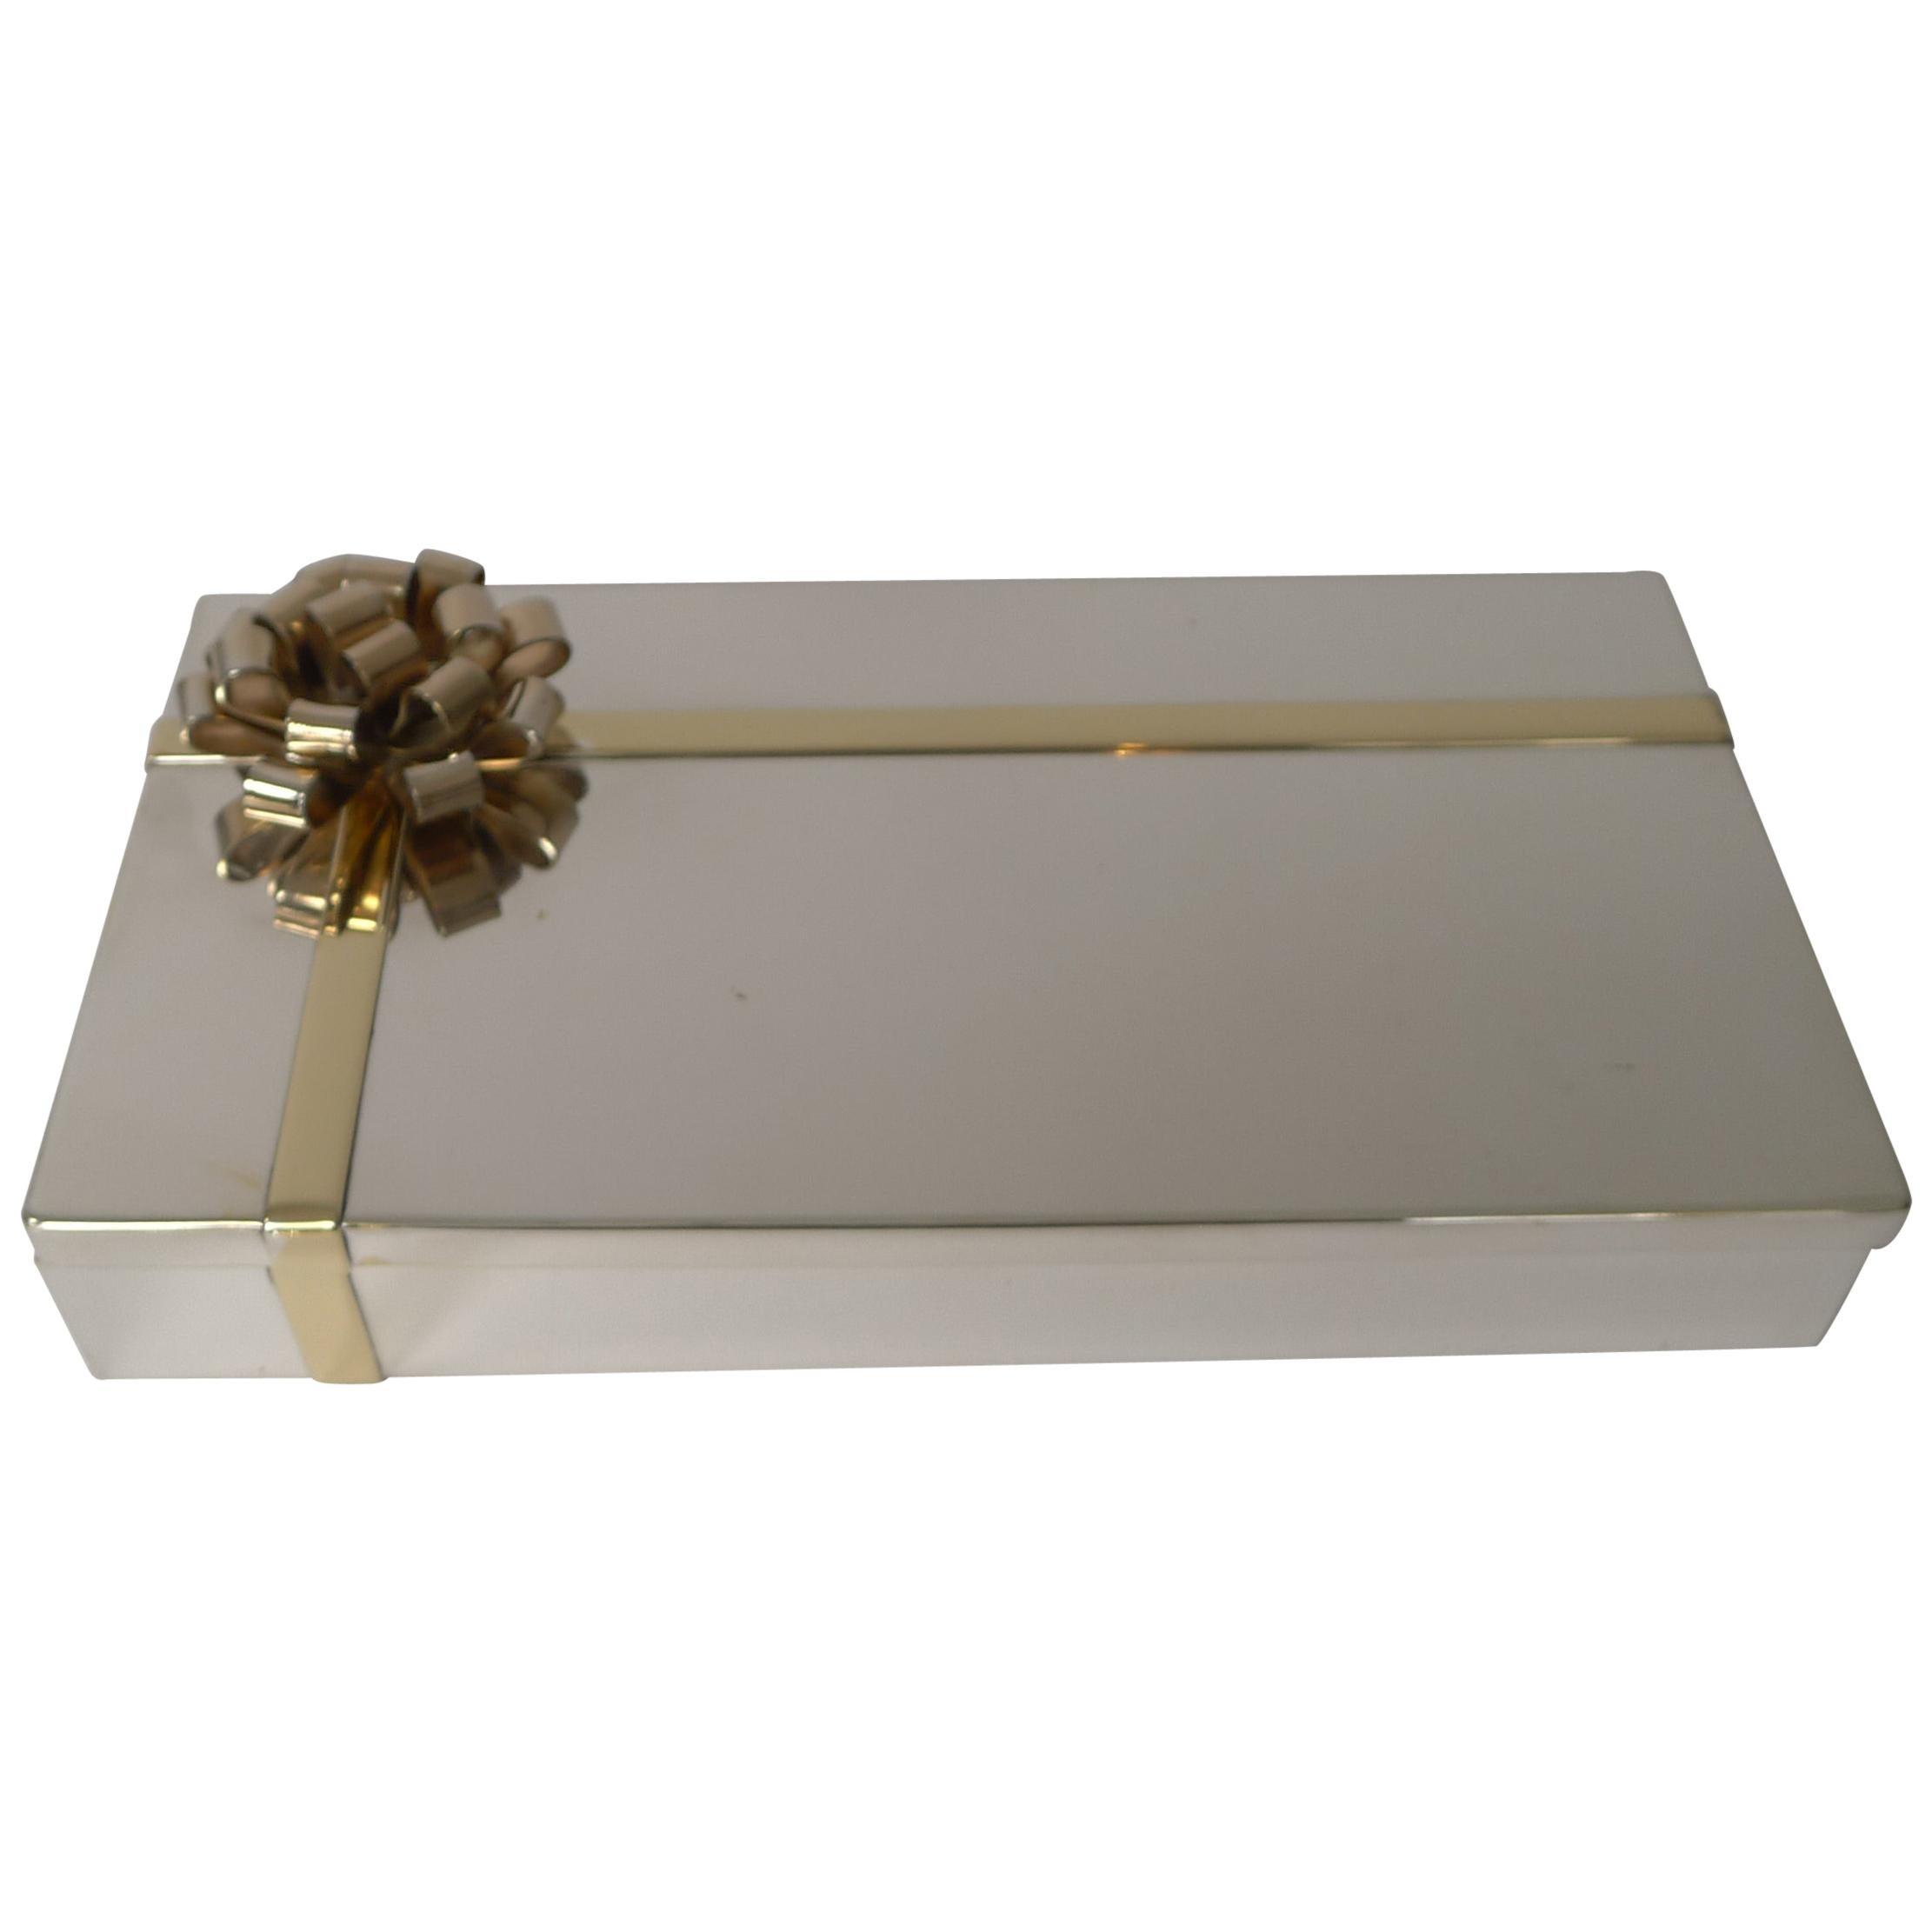 Vintage Modernist Silver and Gold-Plated Box by Egidio Broggi, Milan